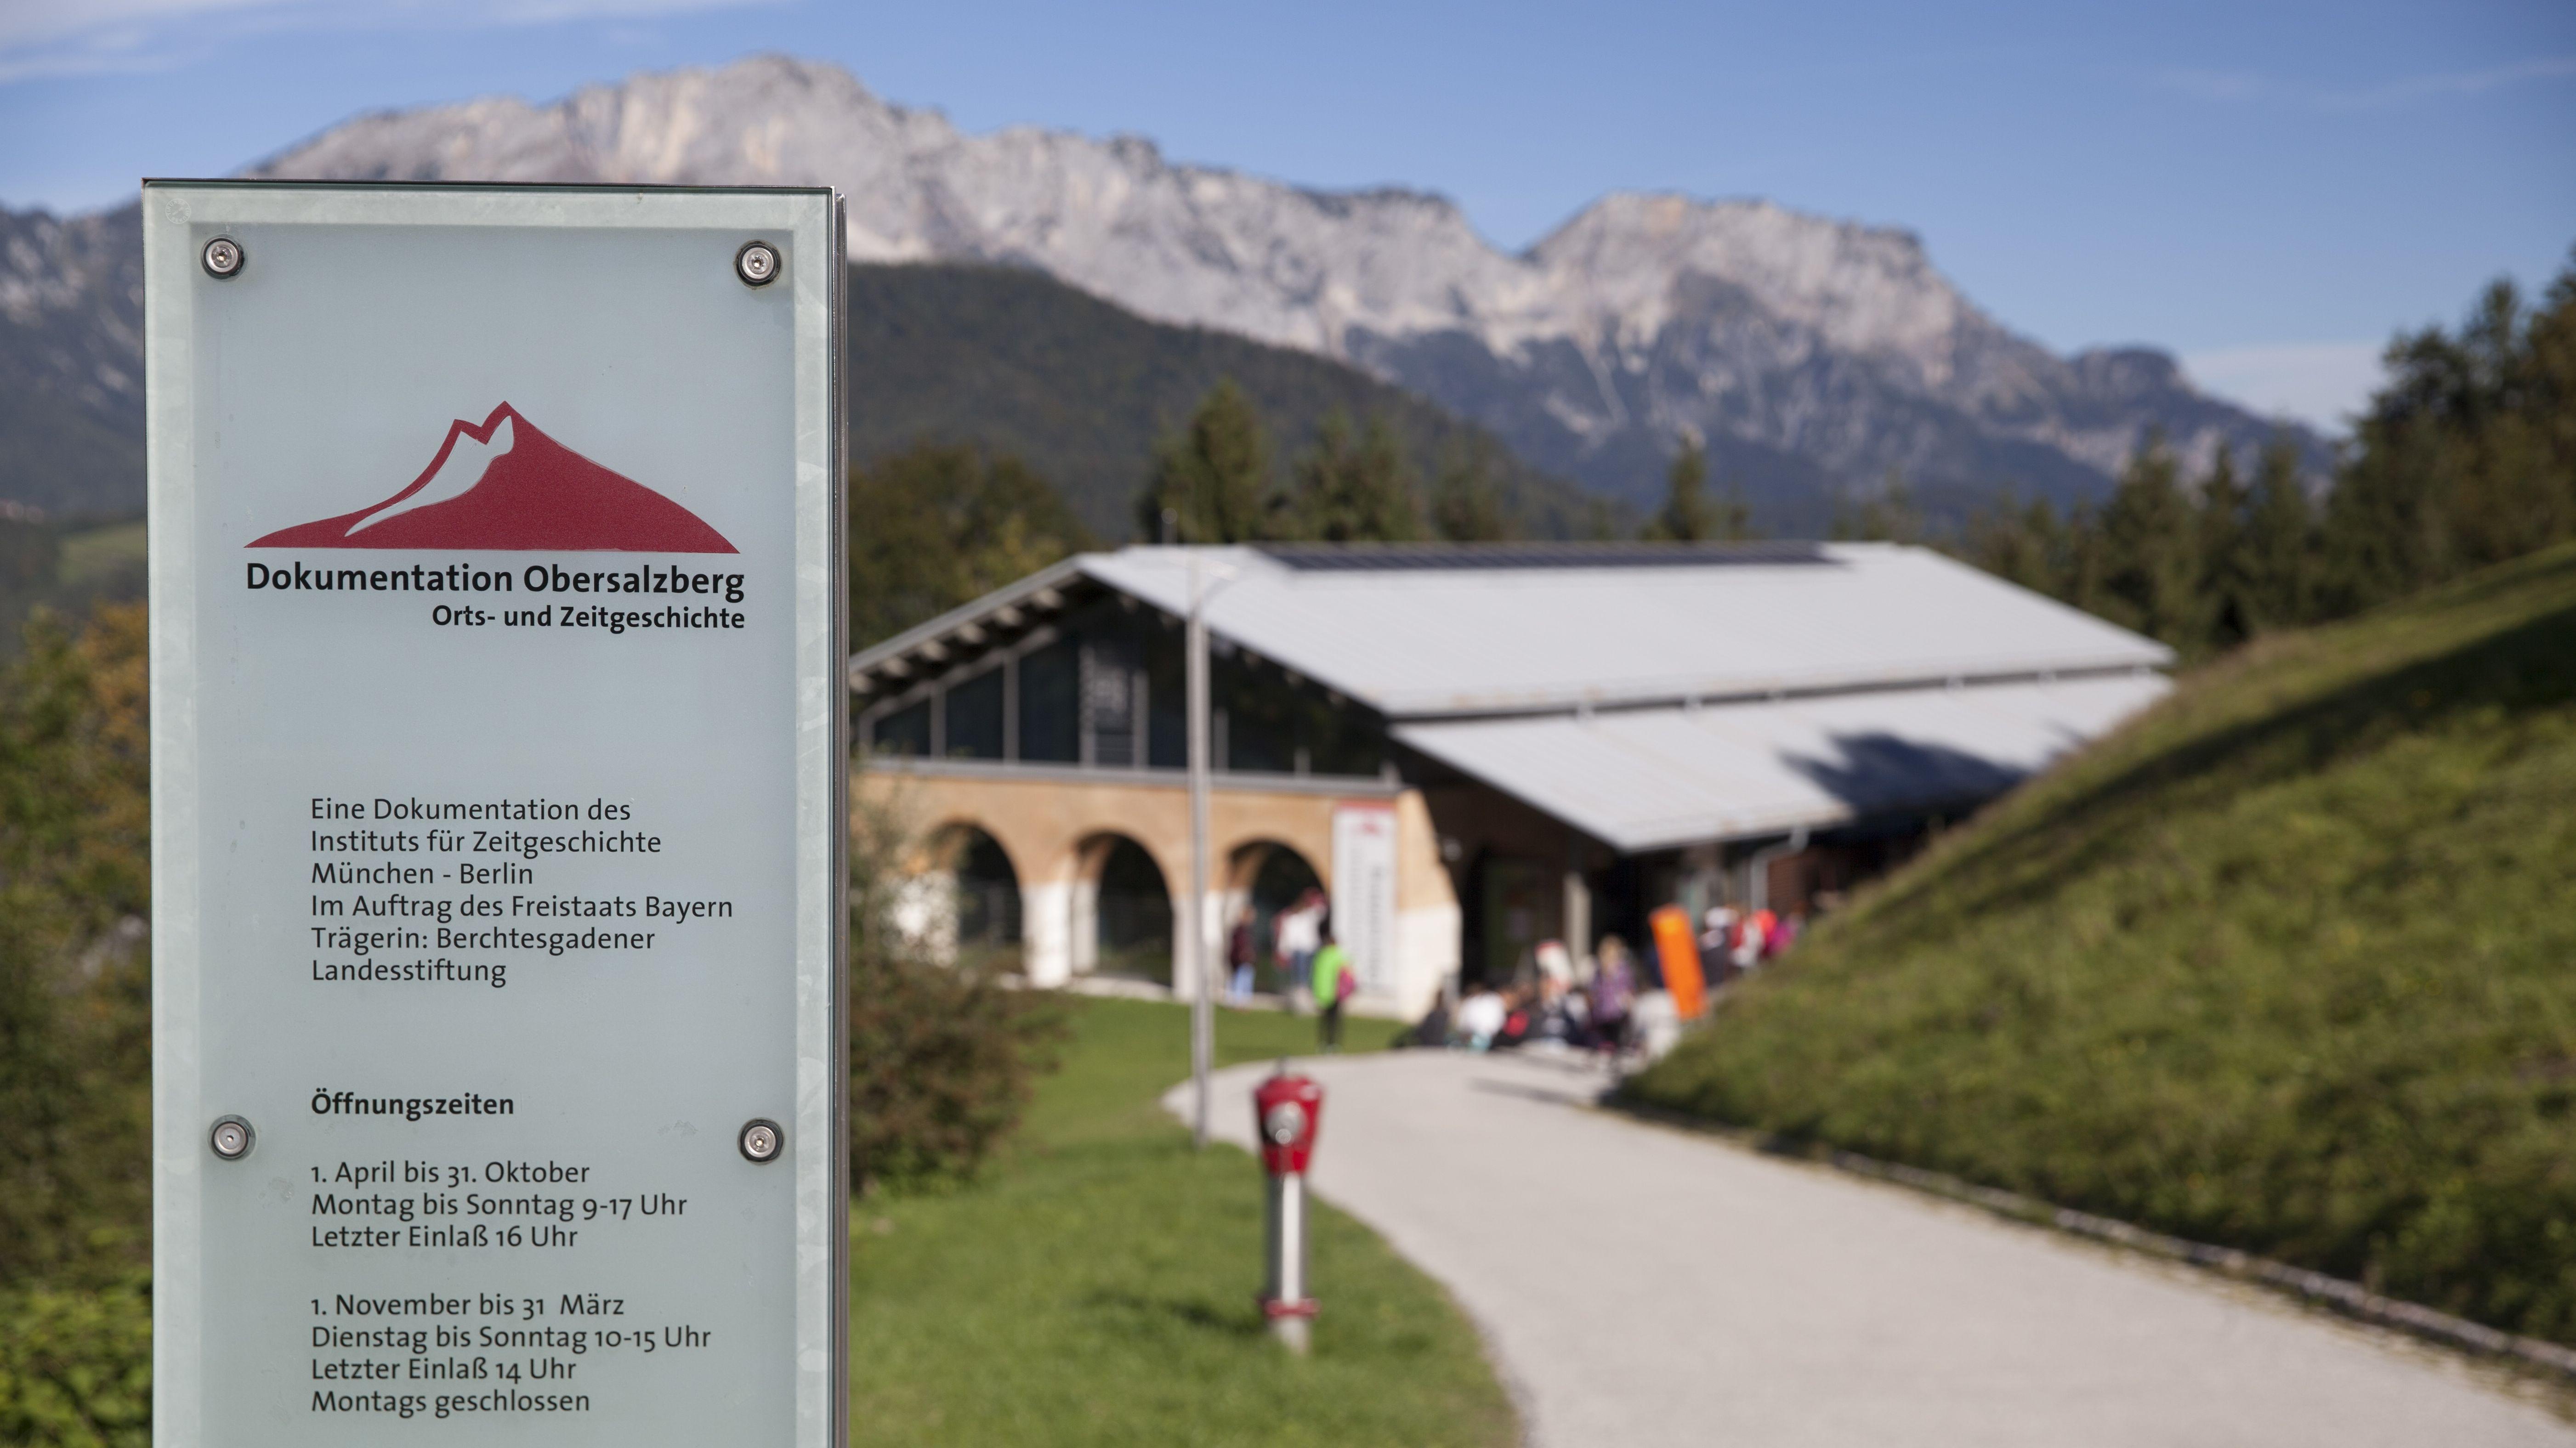 Eingang zum Dokumentationszentrum Obersalzberg.